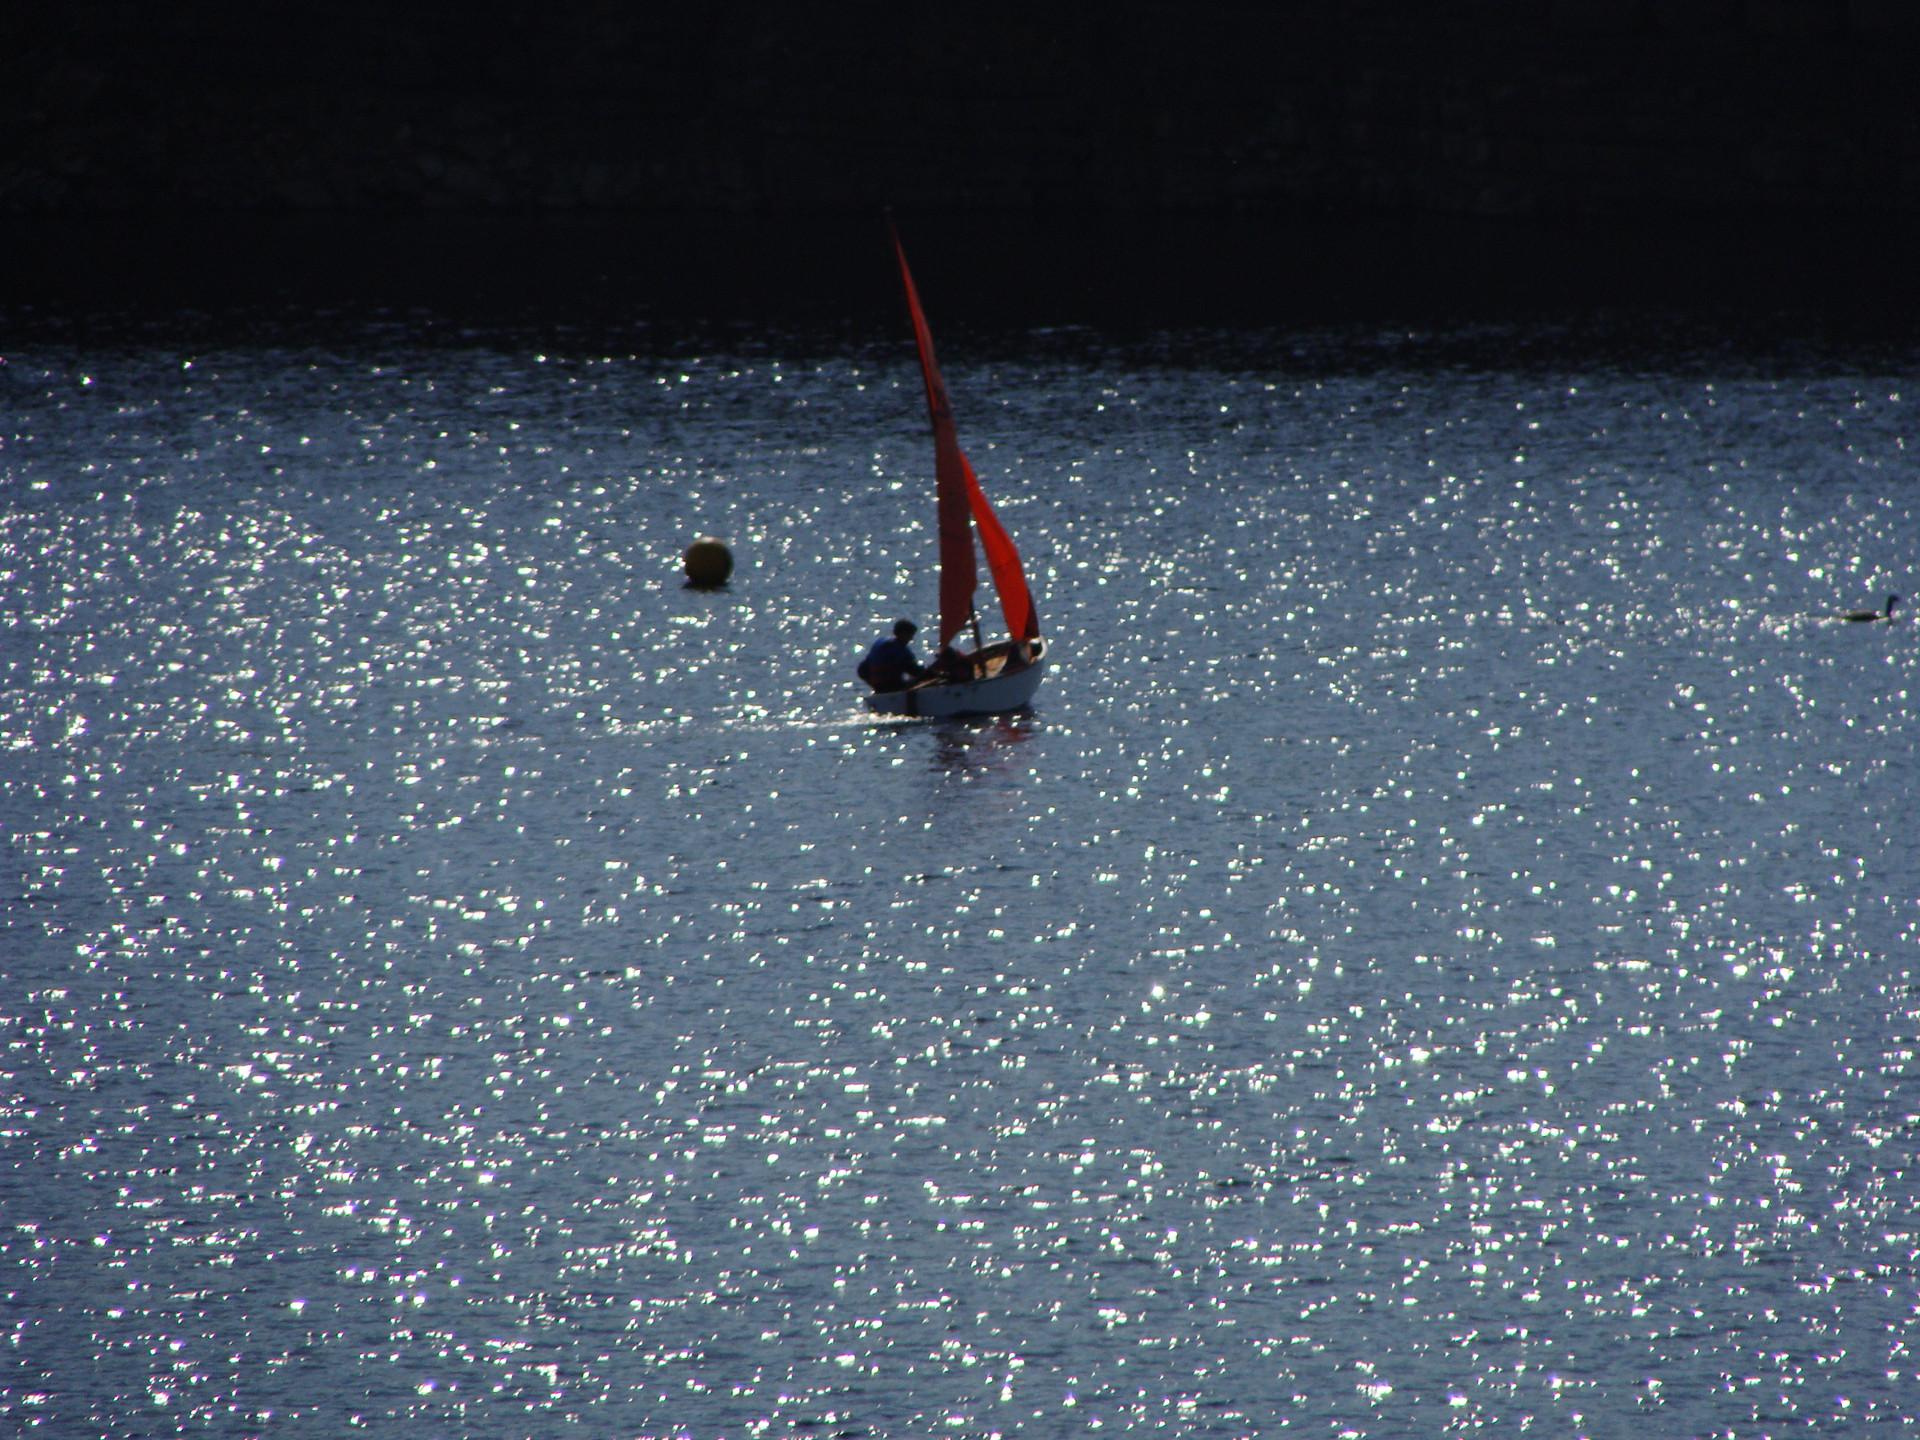 Winscar Reservoir